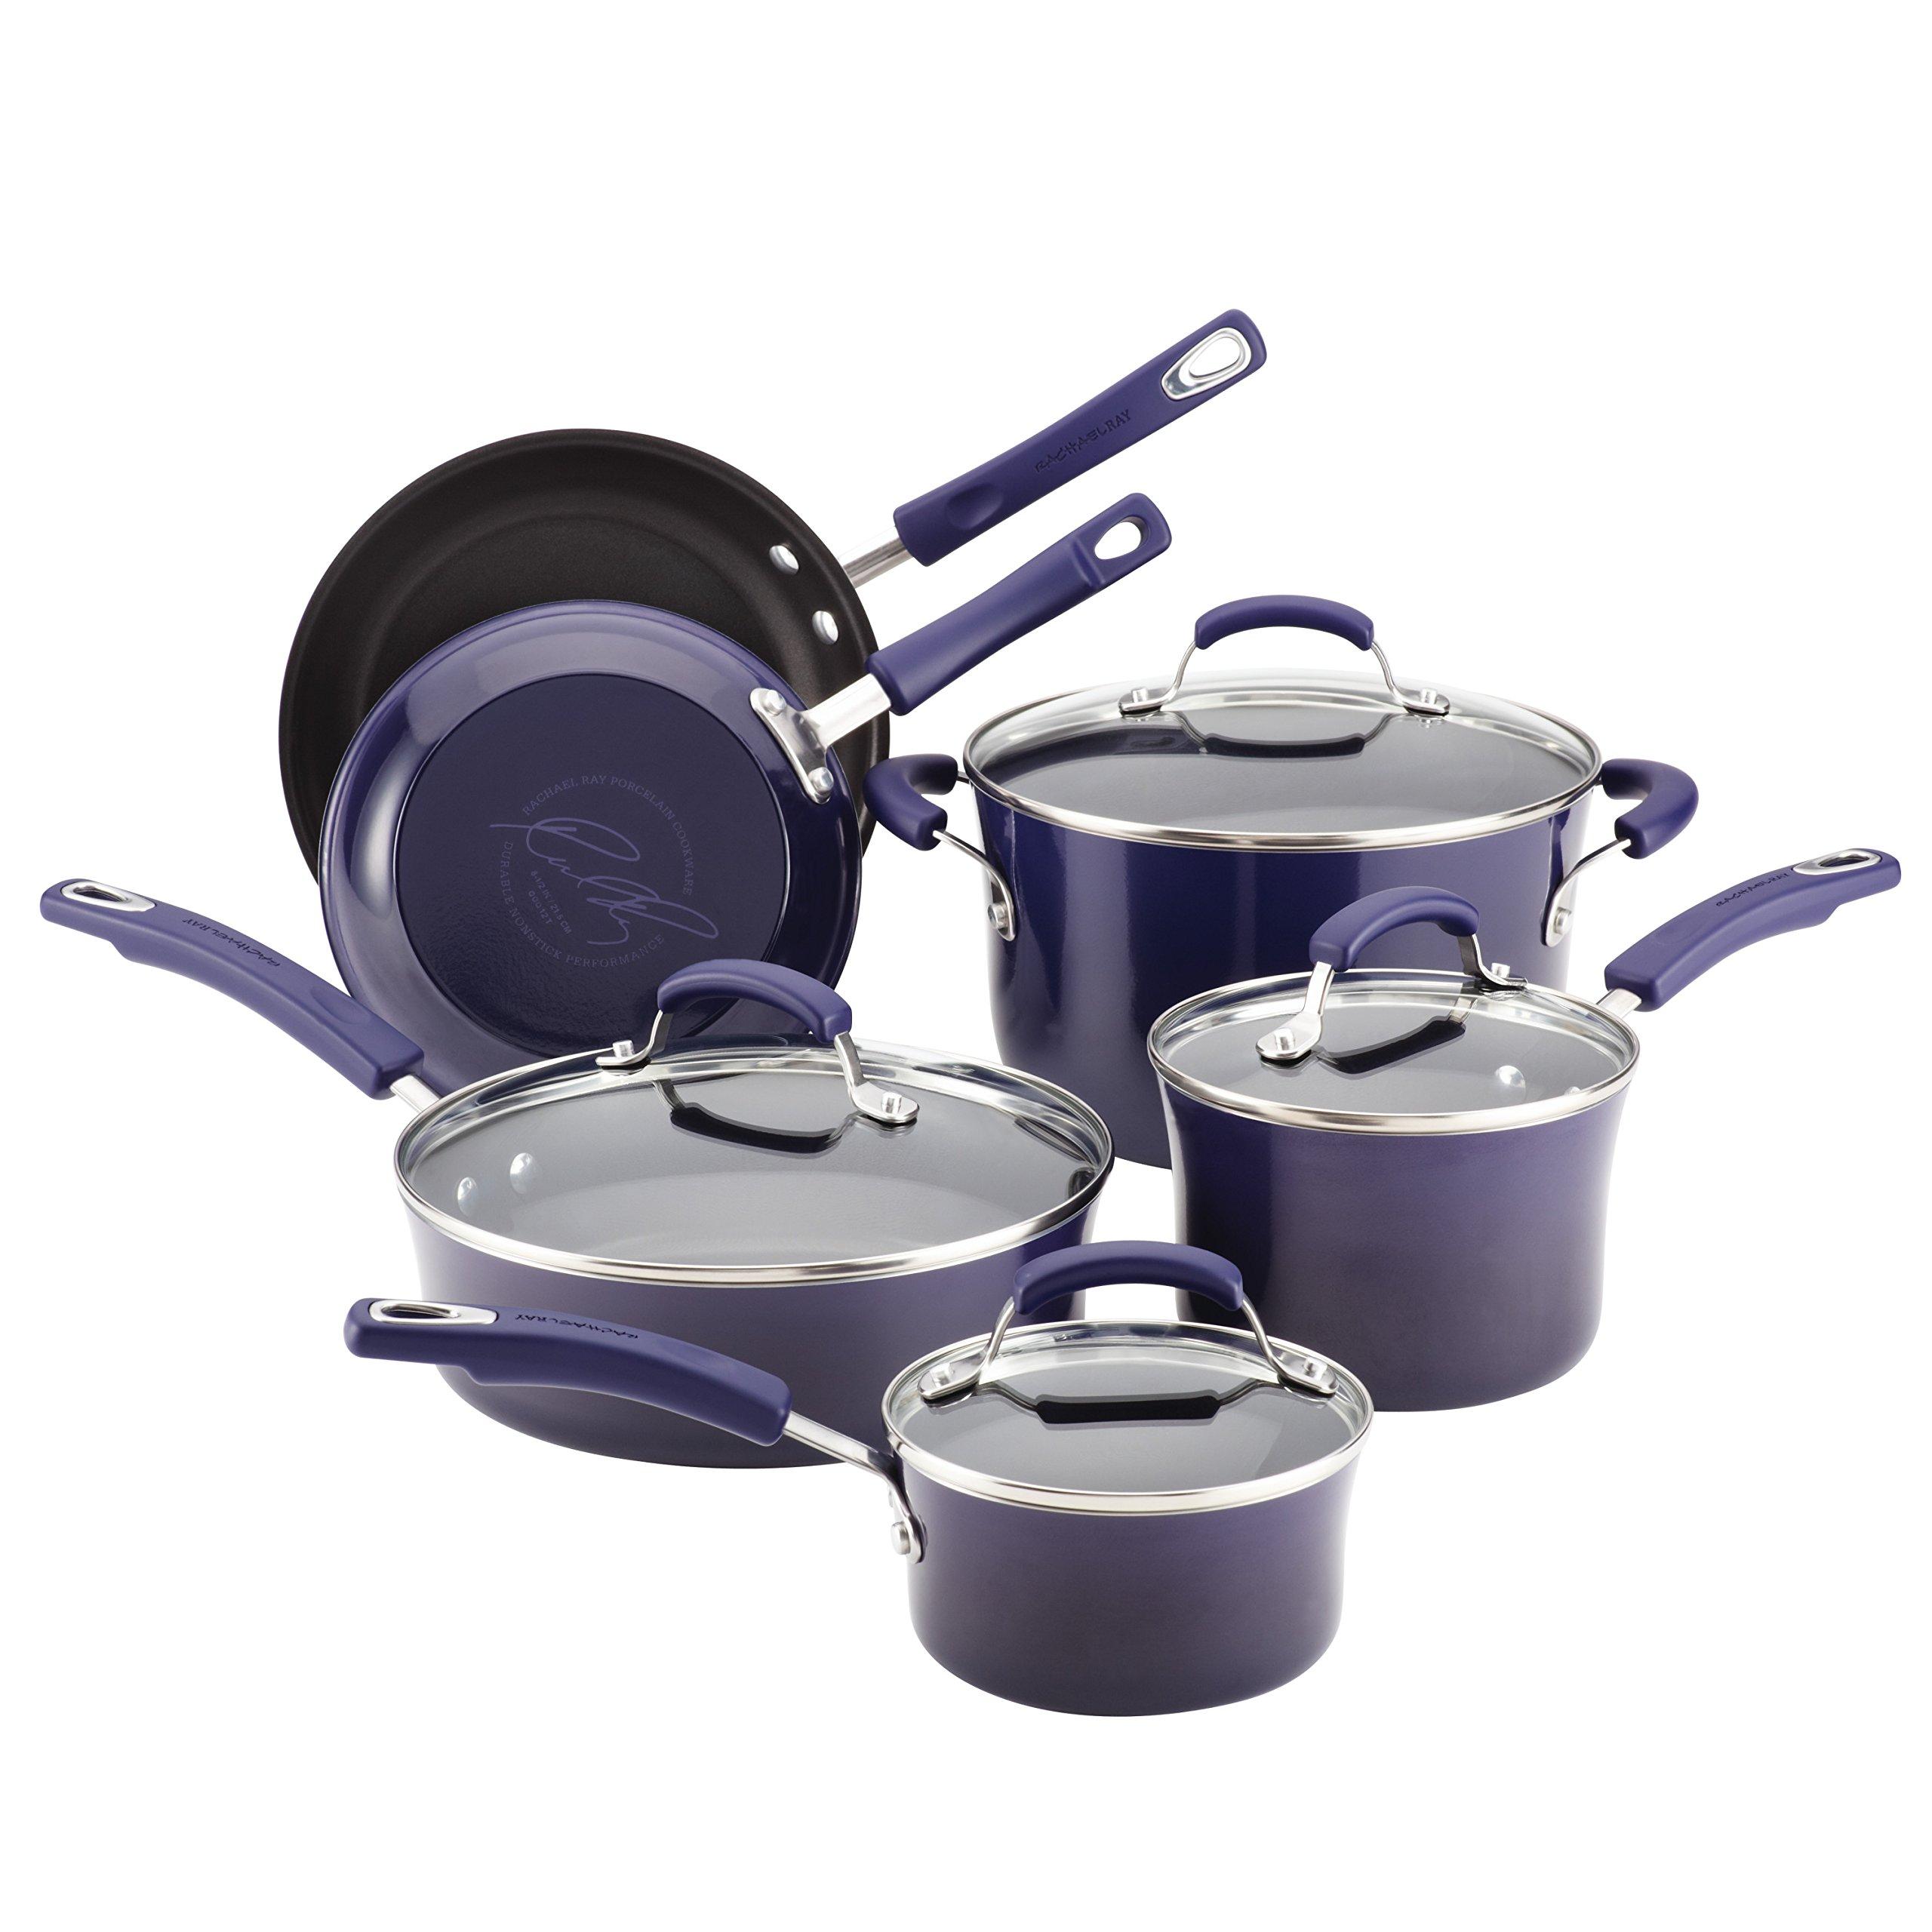 Rachael Ray Classic Brights Hard Enamel Nonstick 10-Piece Cookware Set, Purple Gradient